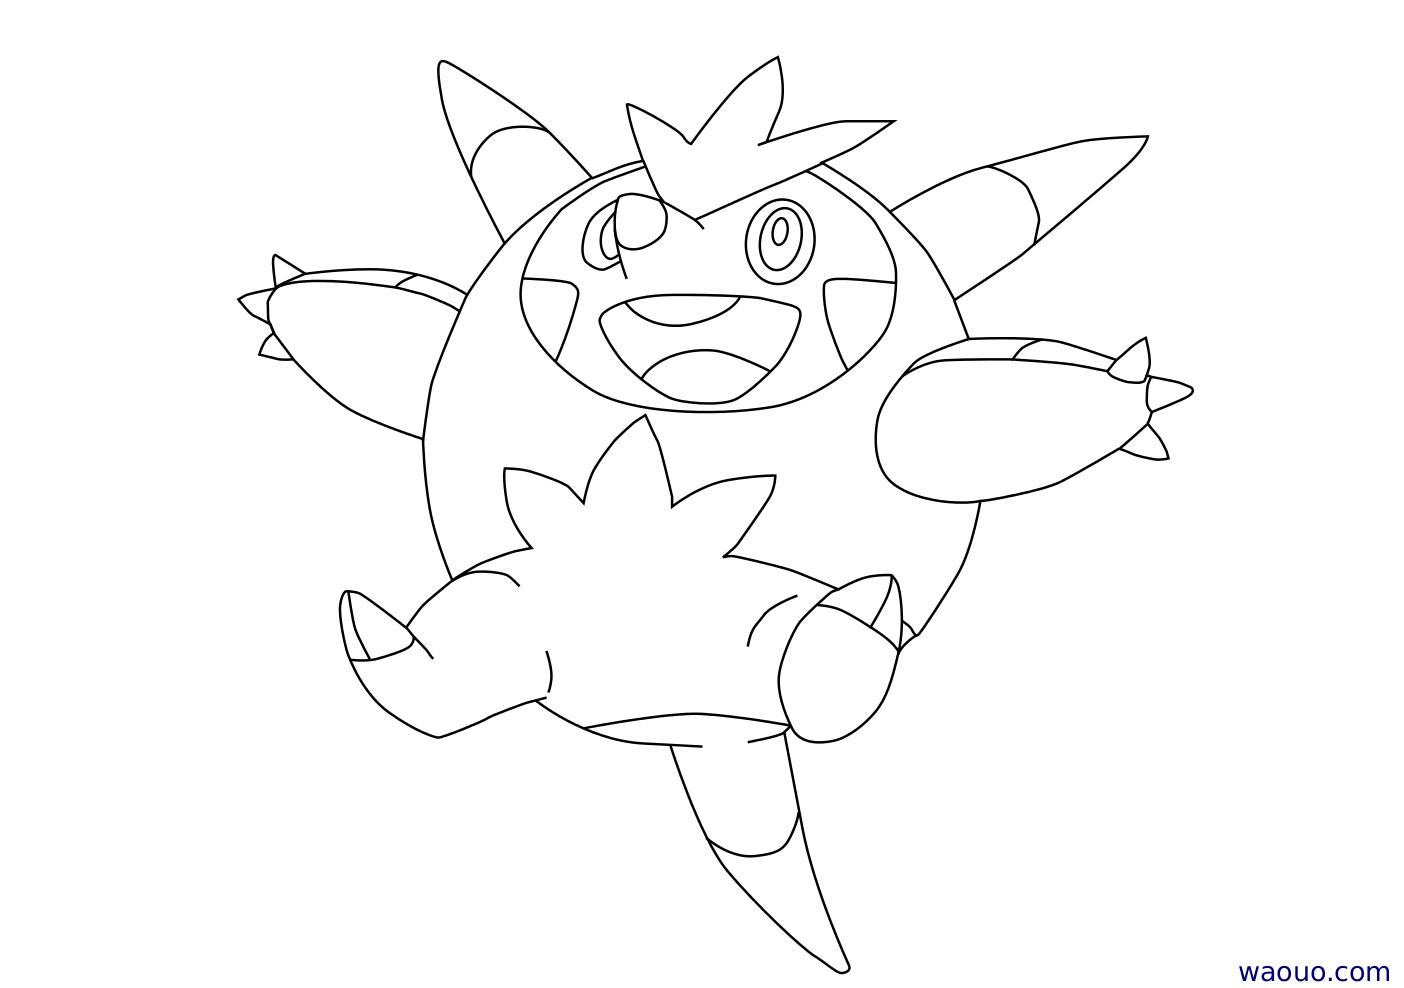 Coloriage bogu risse pokemon x et y imprimer - Coloriage de pokemon x y ...